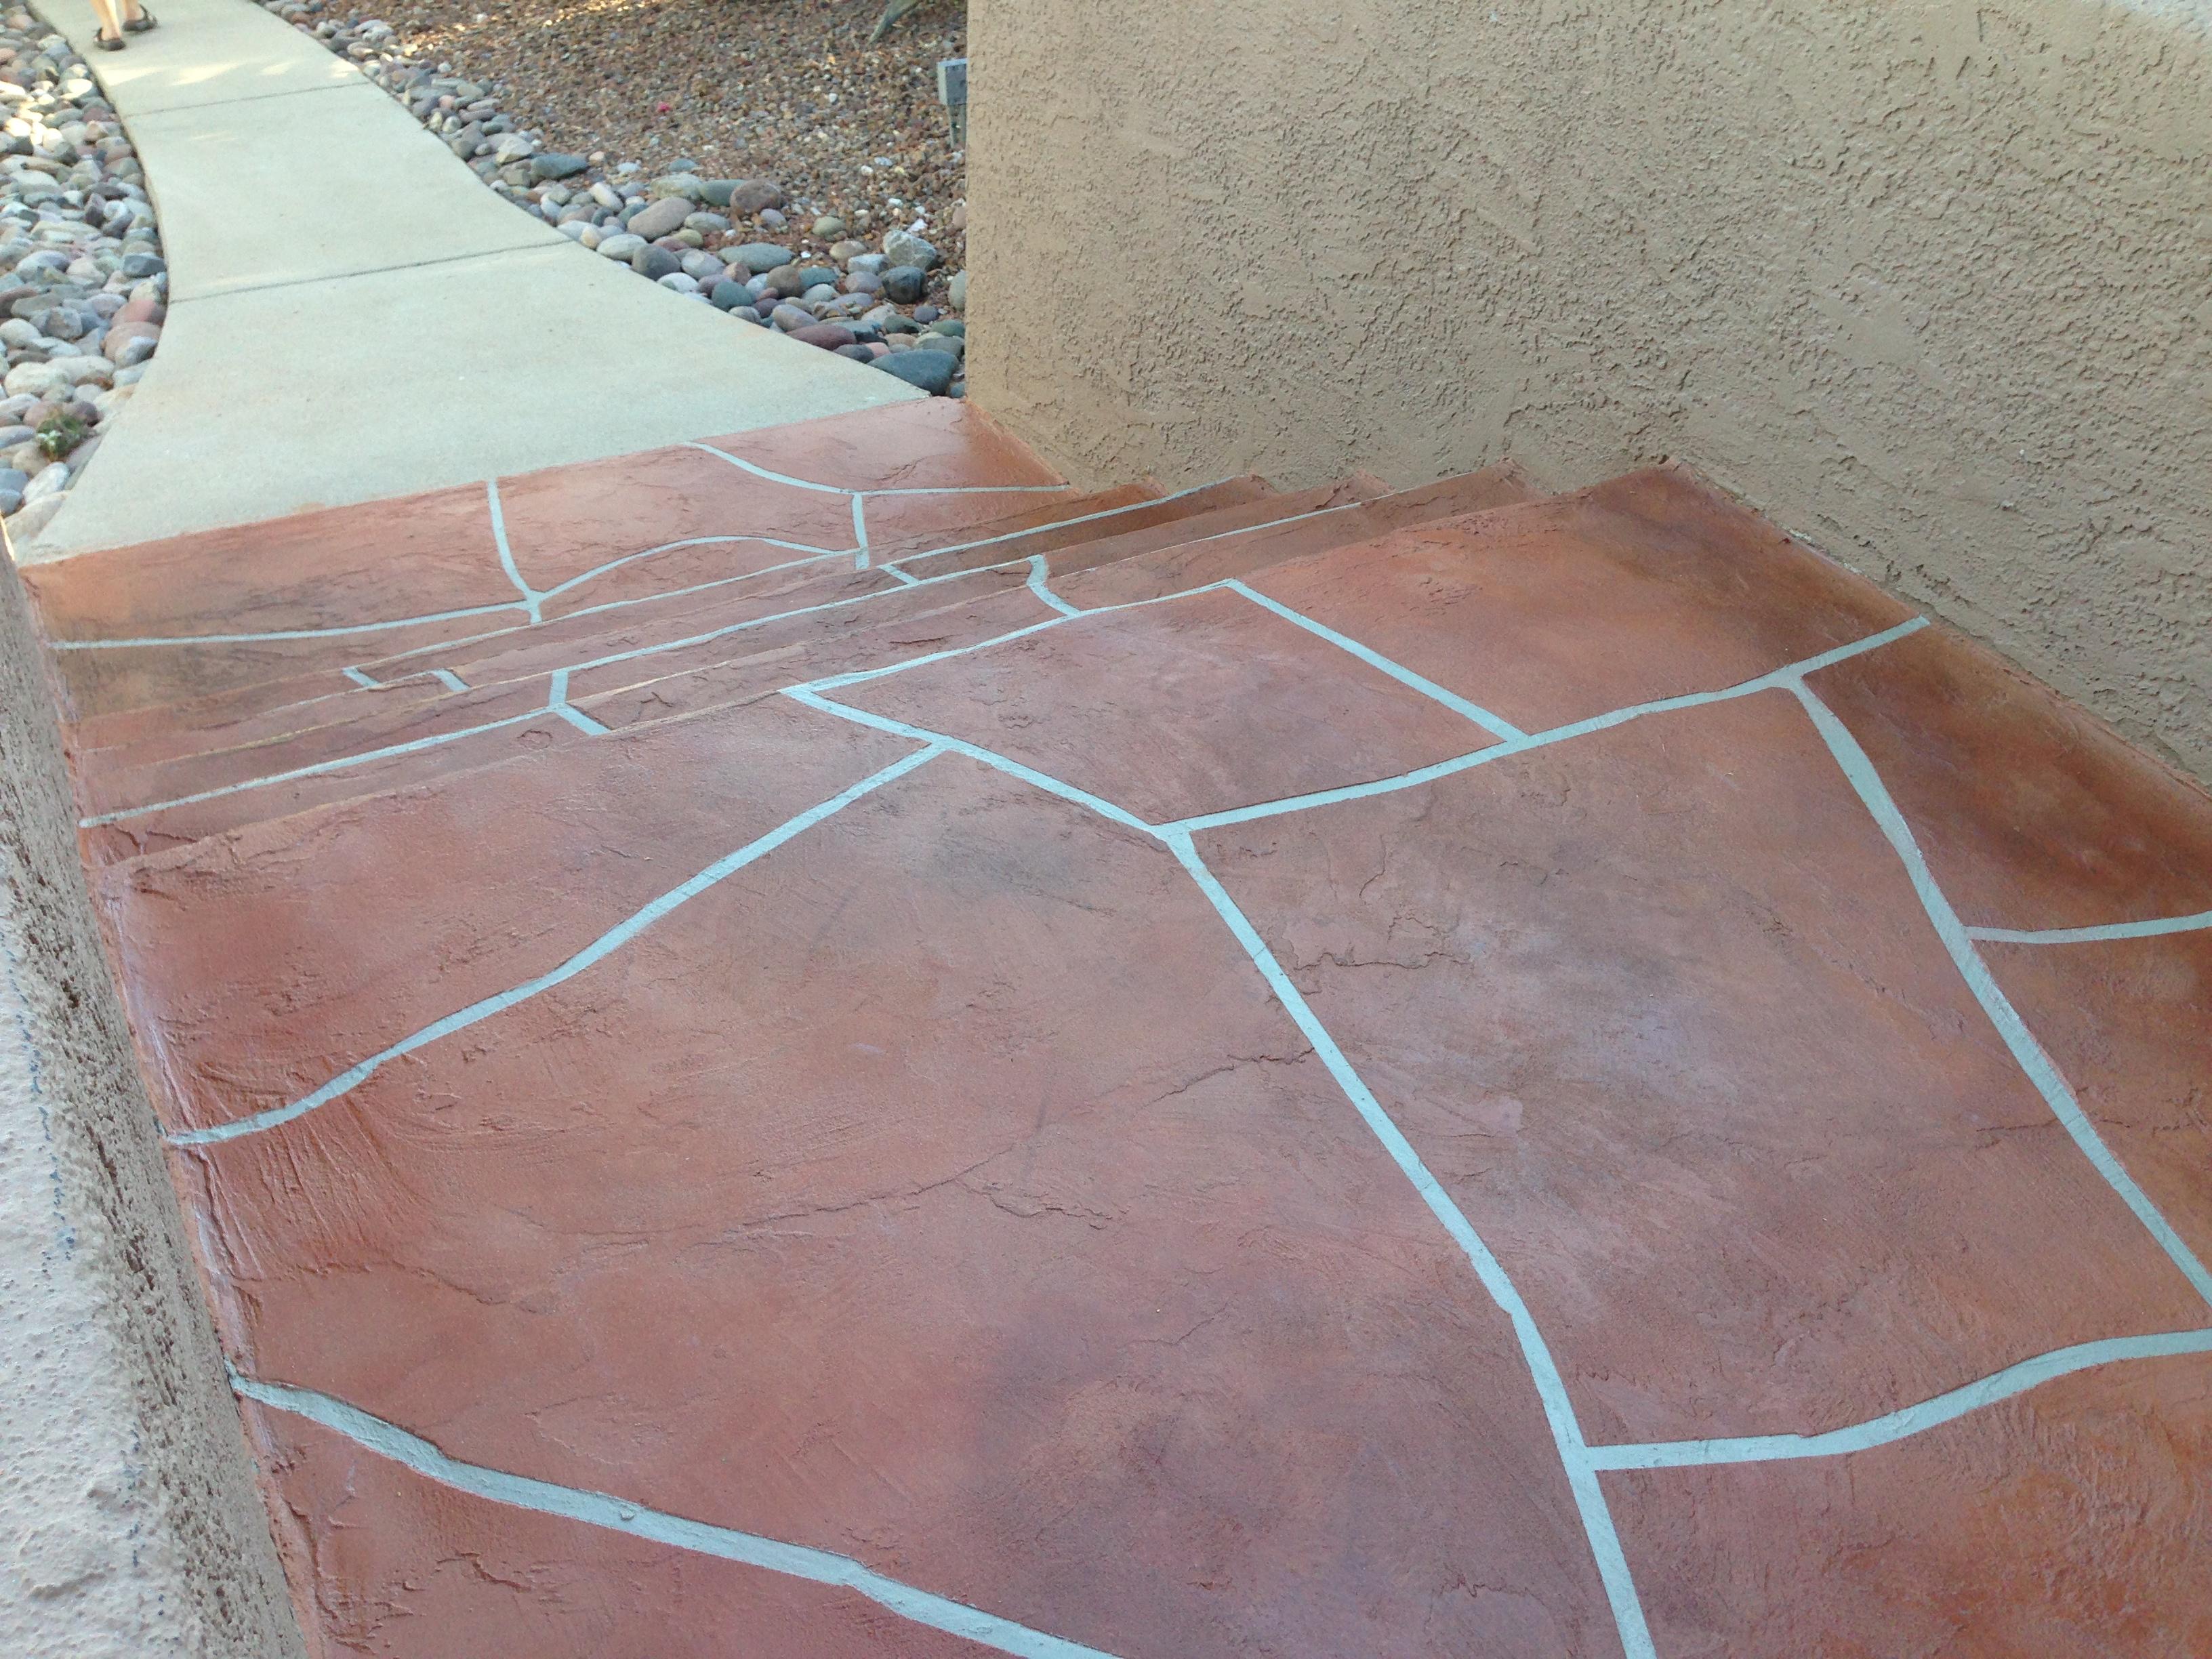 Decorative Concrete Overlay Tucson Concrete Patio Decorative Concrete Flooring Overlays